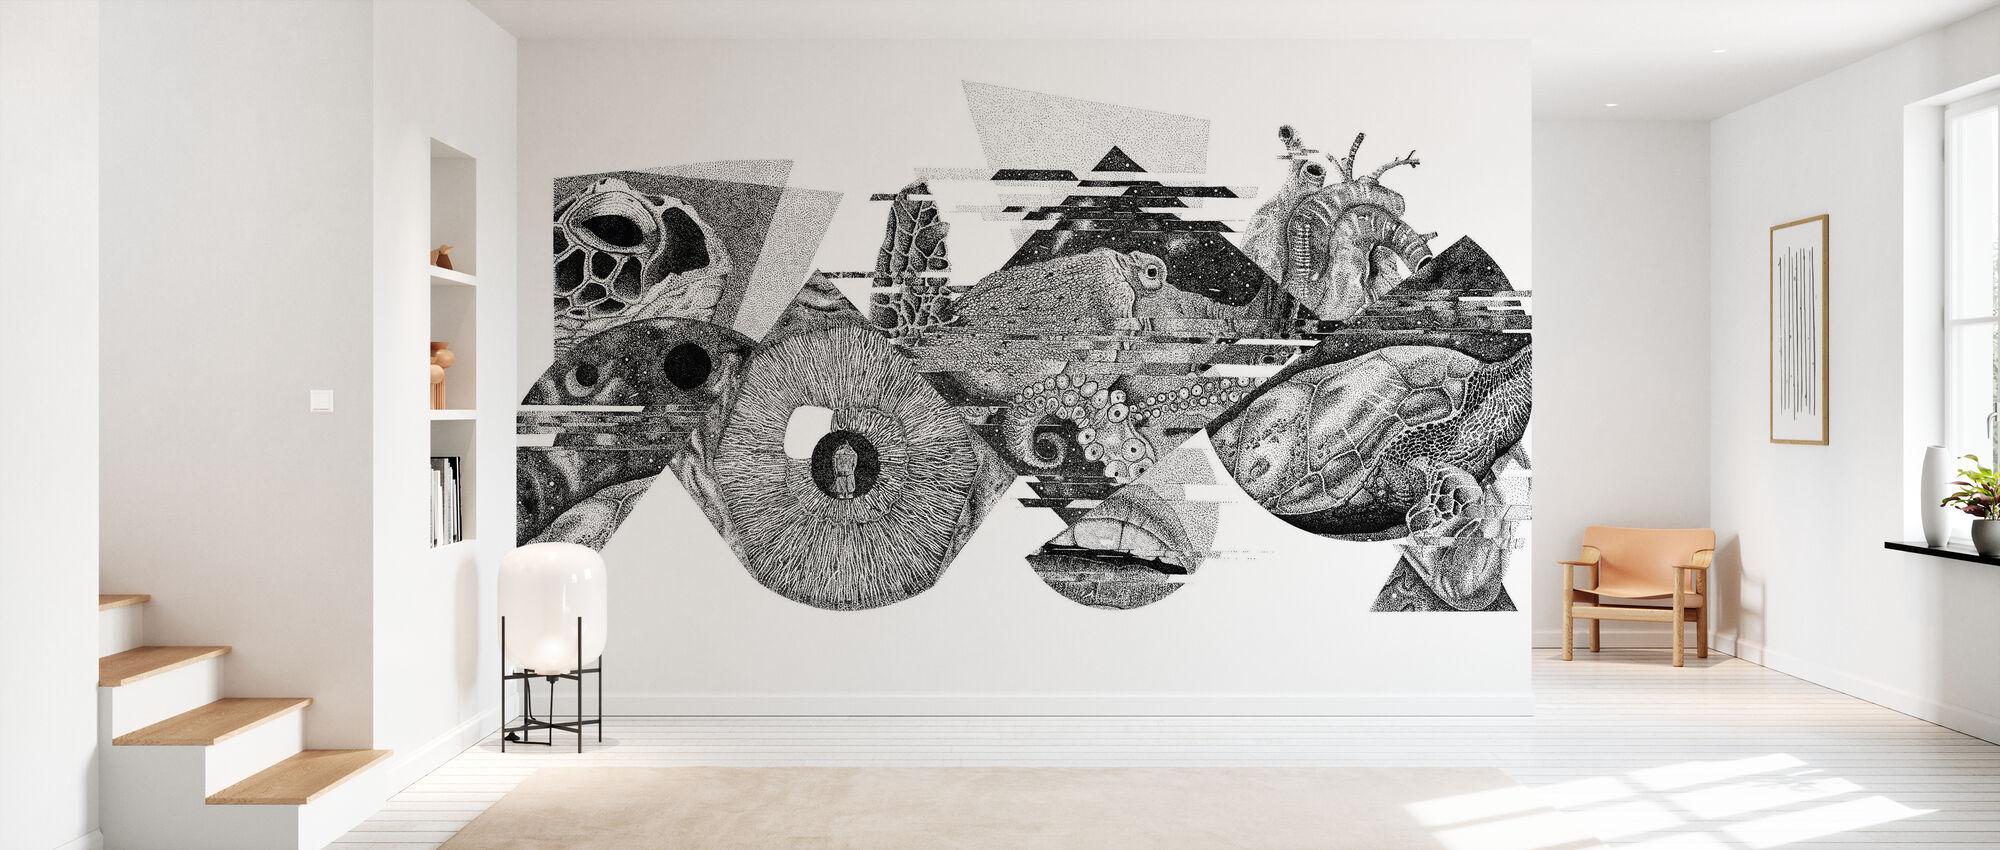 Interrupted Universe V - Wallpaper - Hallway